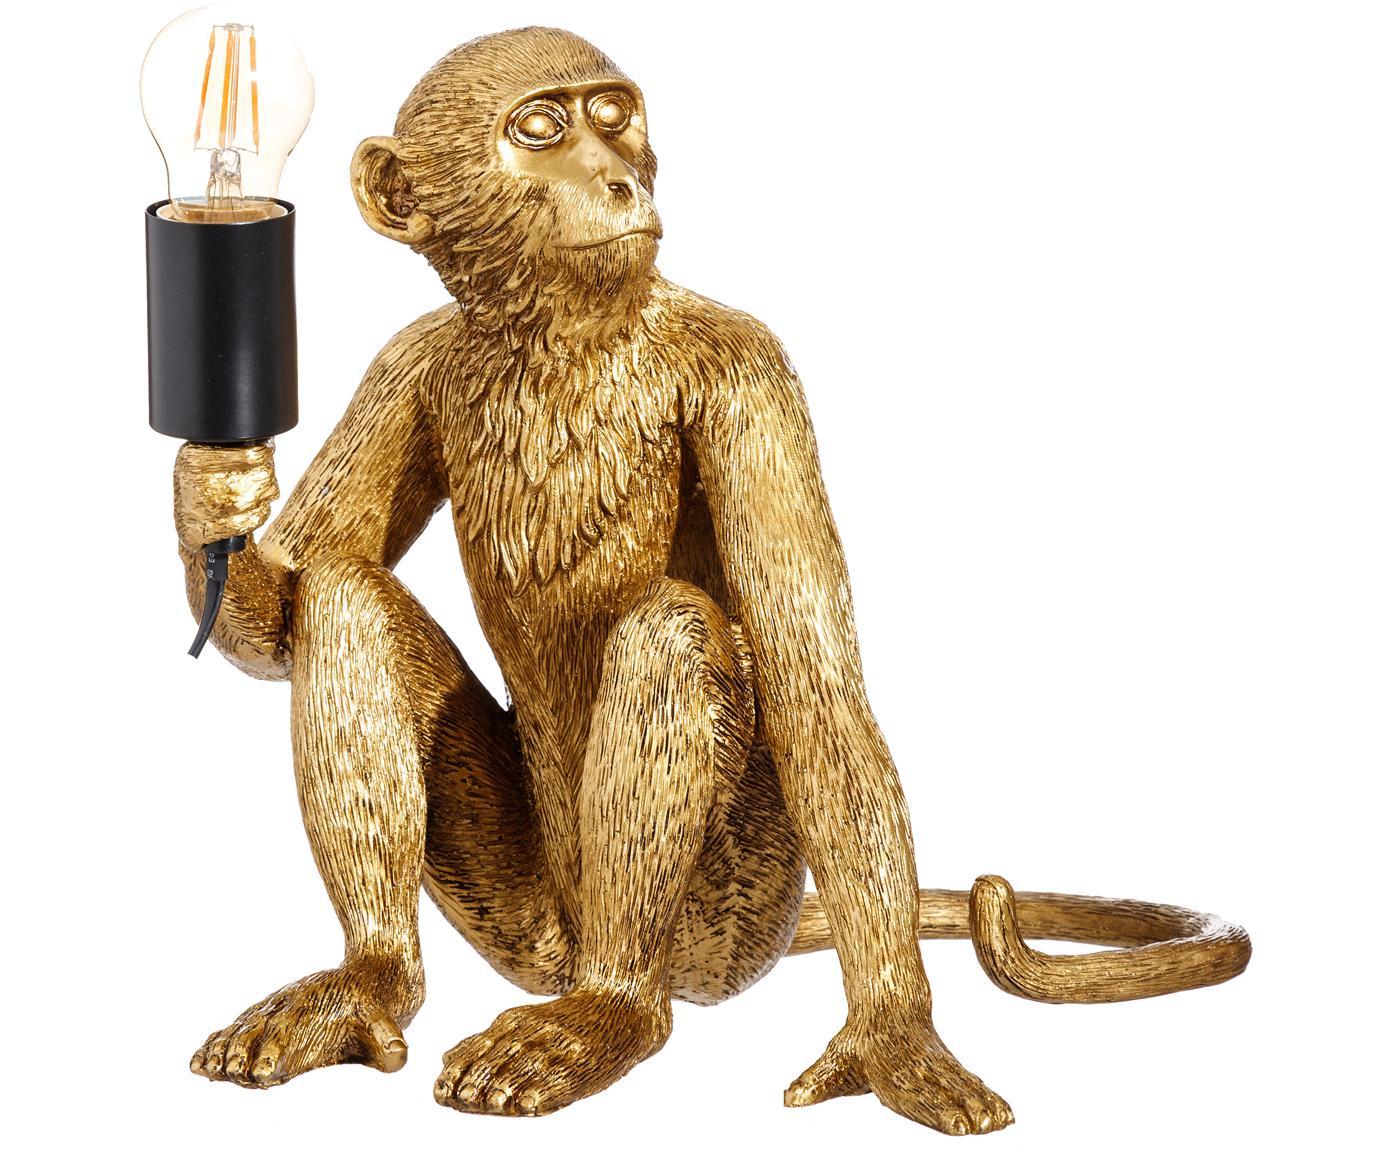 Tischleuchte Monkey, Polyresin, Messingfarben, 31 x 31 cm